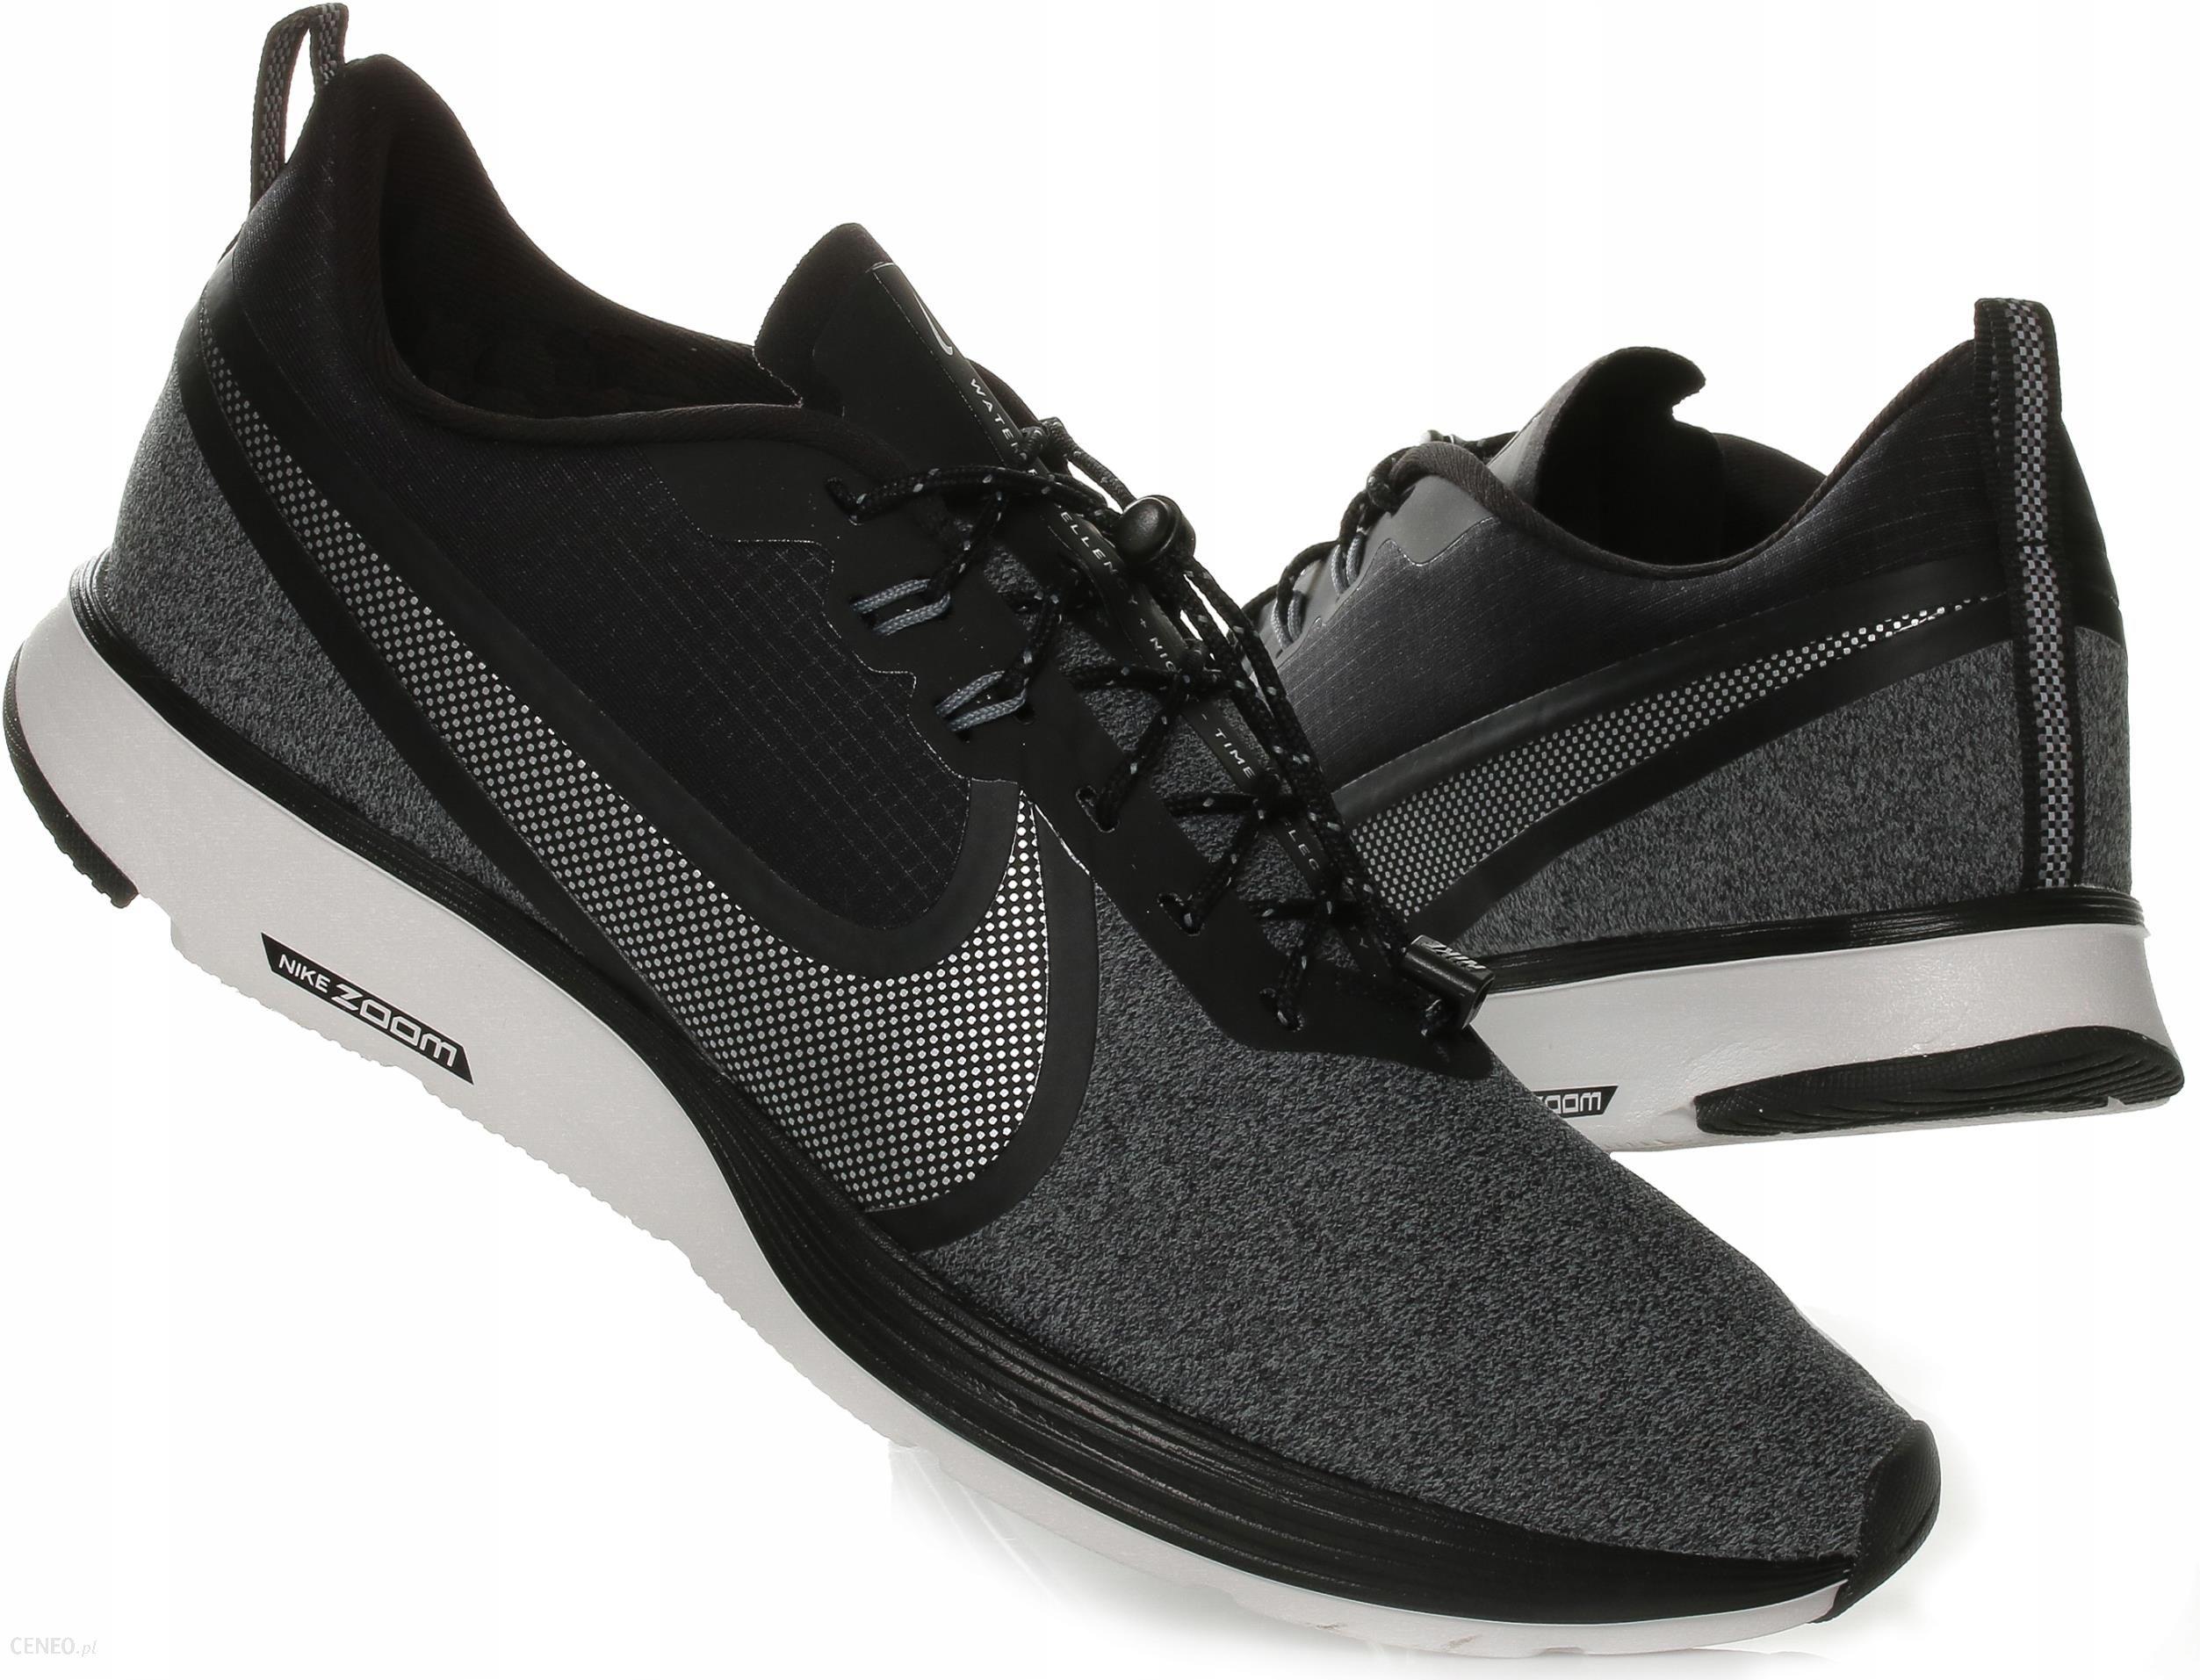 6ef9a687 Buty męskie Nike Zoom Strike 2 Shield AR9799-002 - Ceny i opinie ...